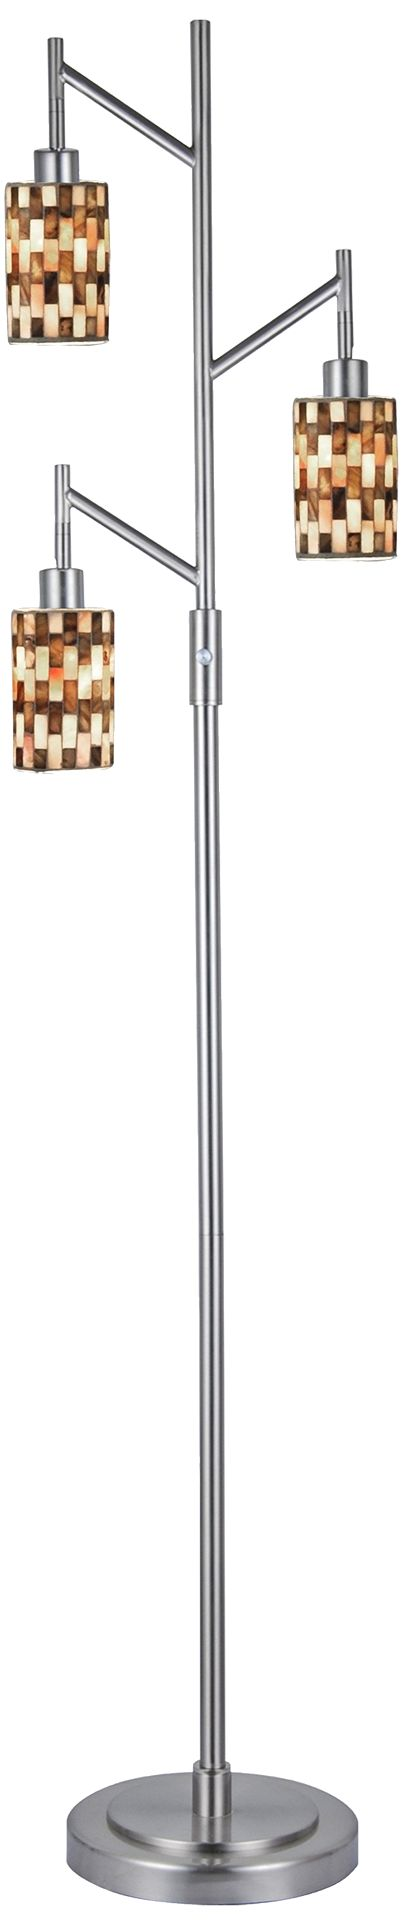 dale tiffany kalmia brushed nickel 3light mosaic floor lamp